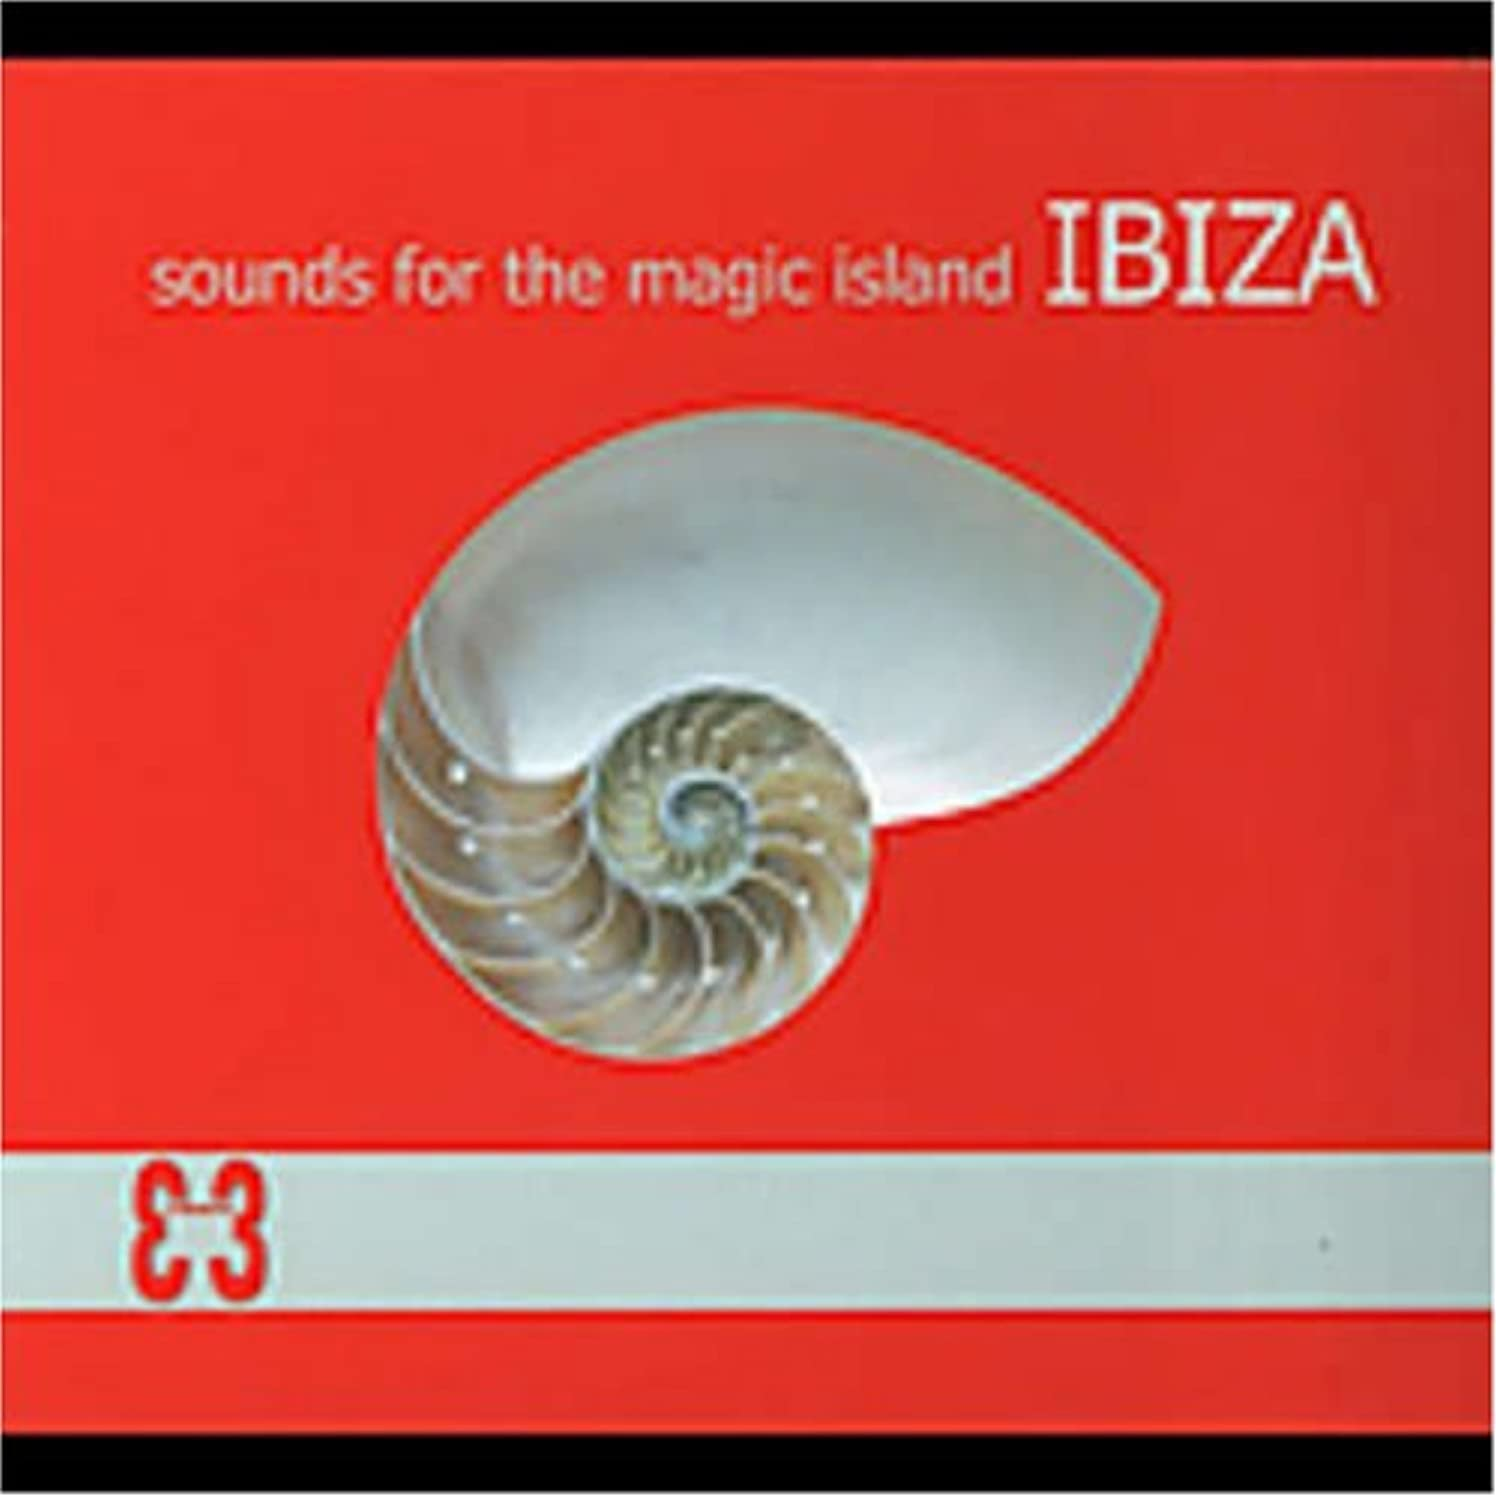 Sounds for the Magic Island Ibiza 3